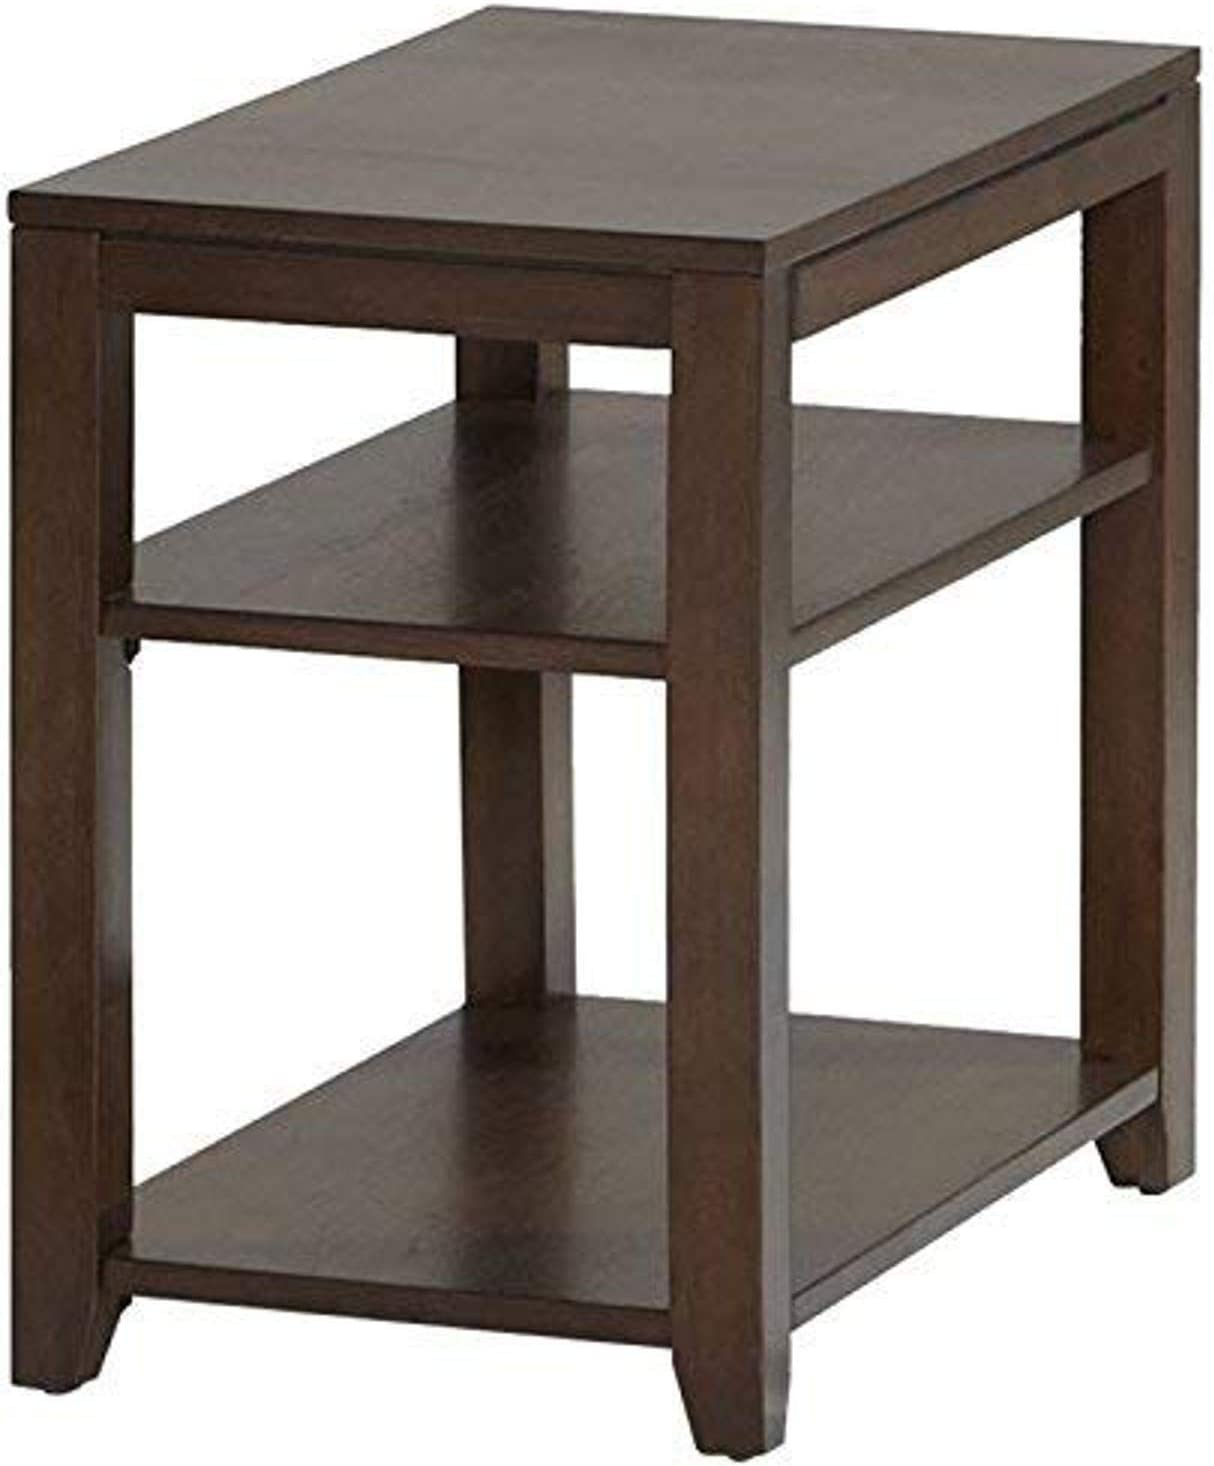 Progressive Furniture Daytona Chairside Table, Regal Walnut